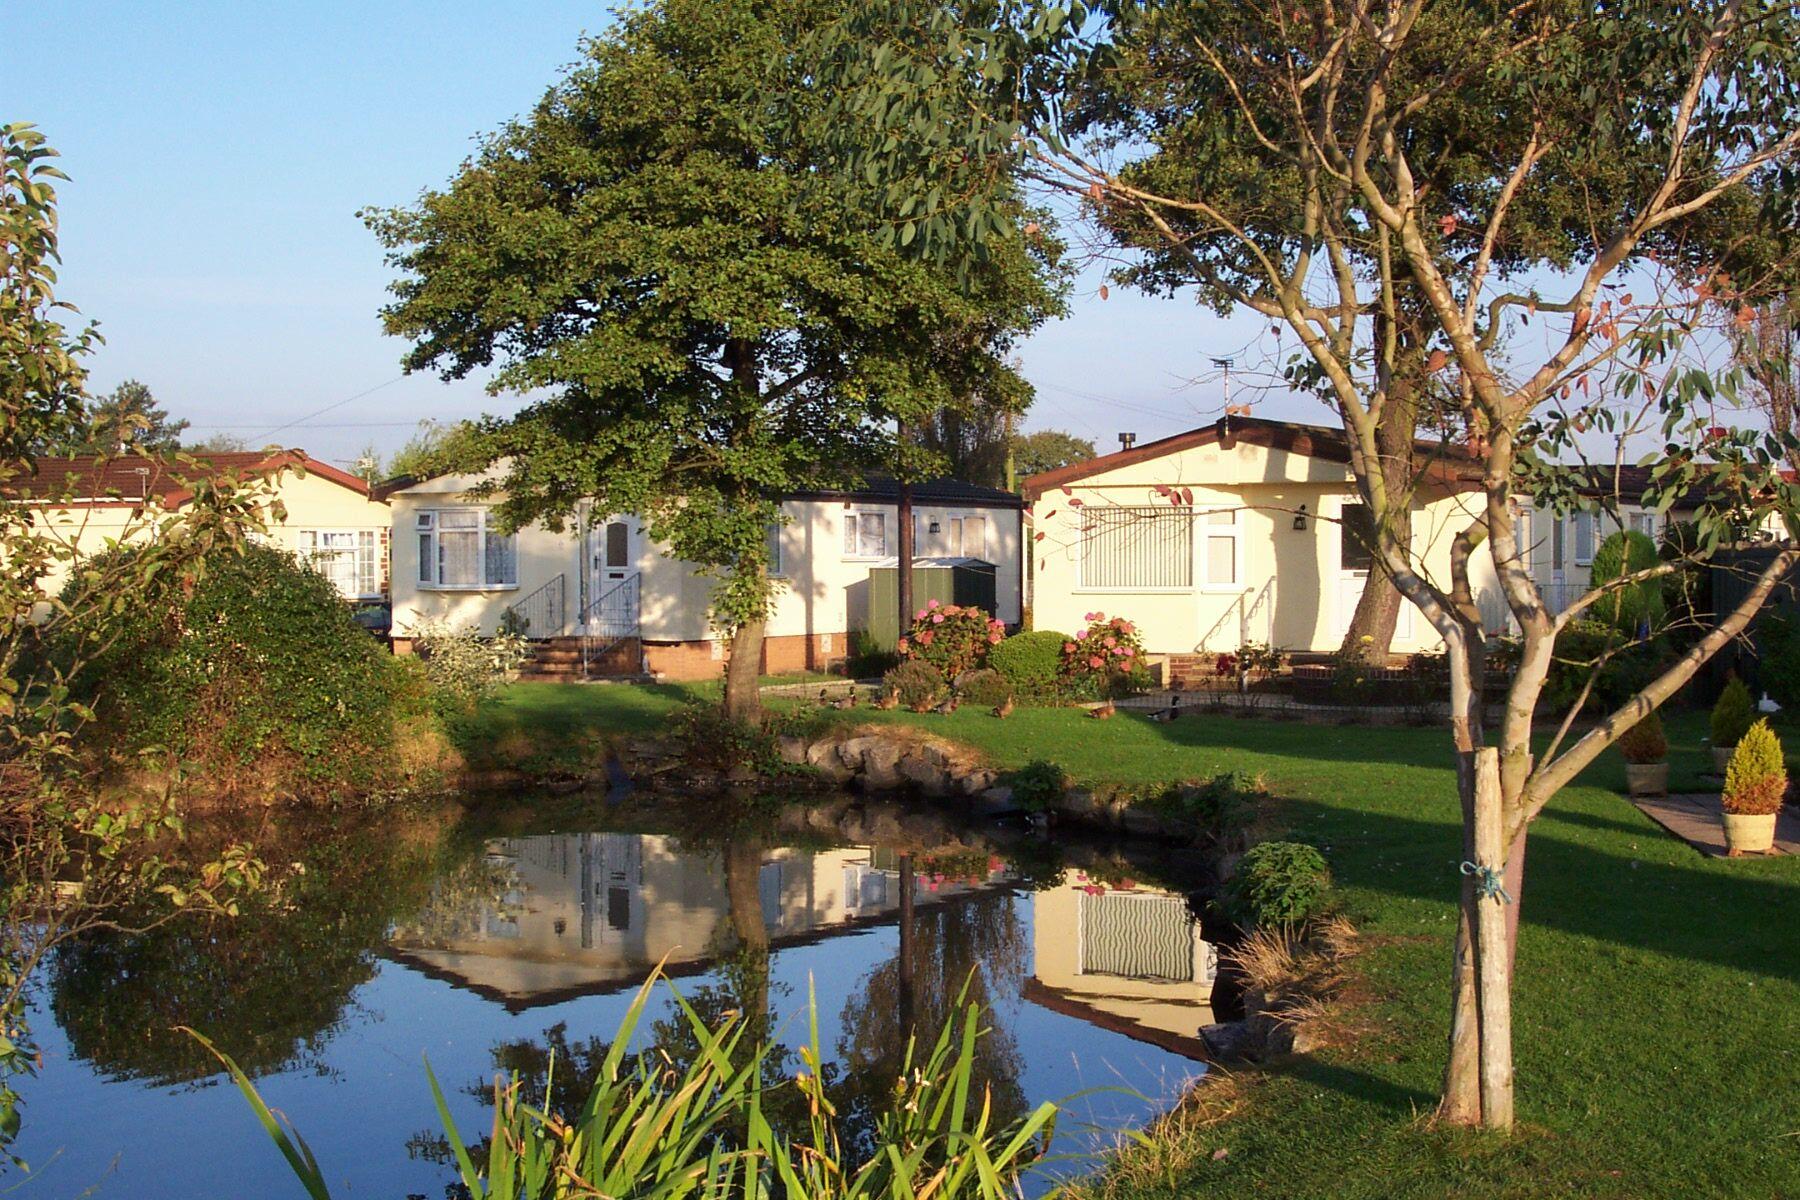 Wyre Vale Pond